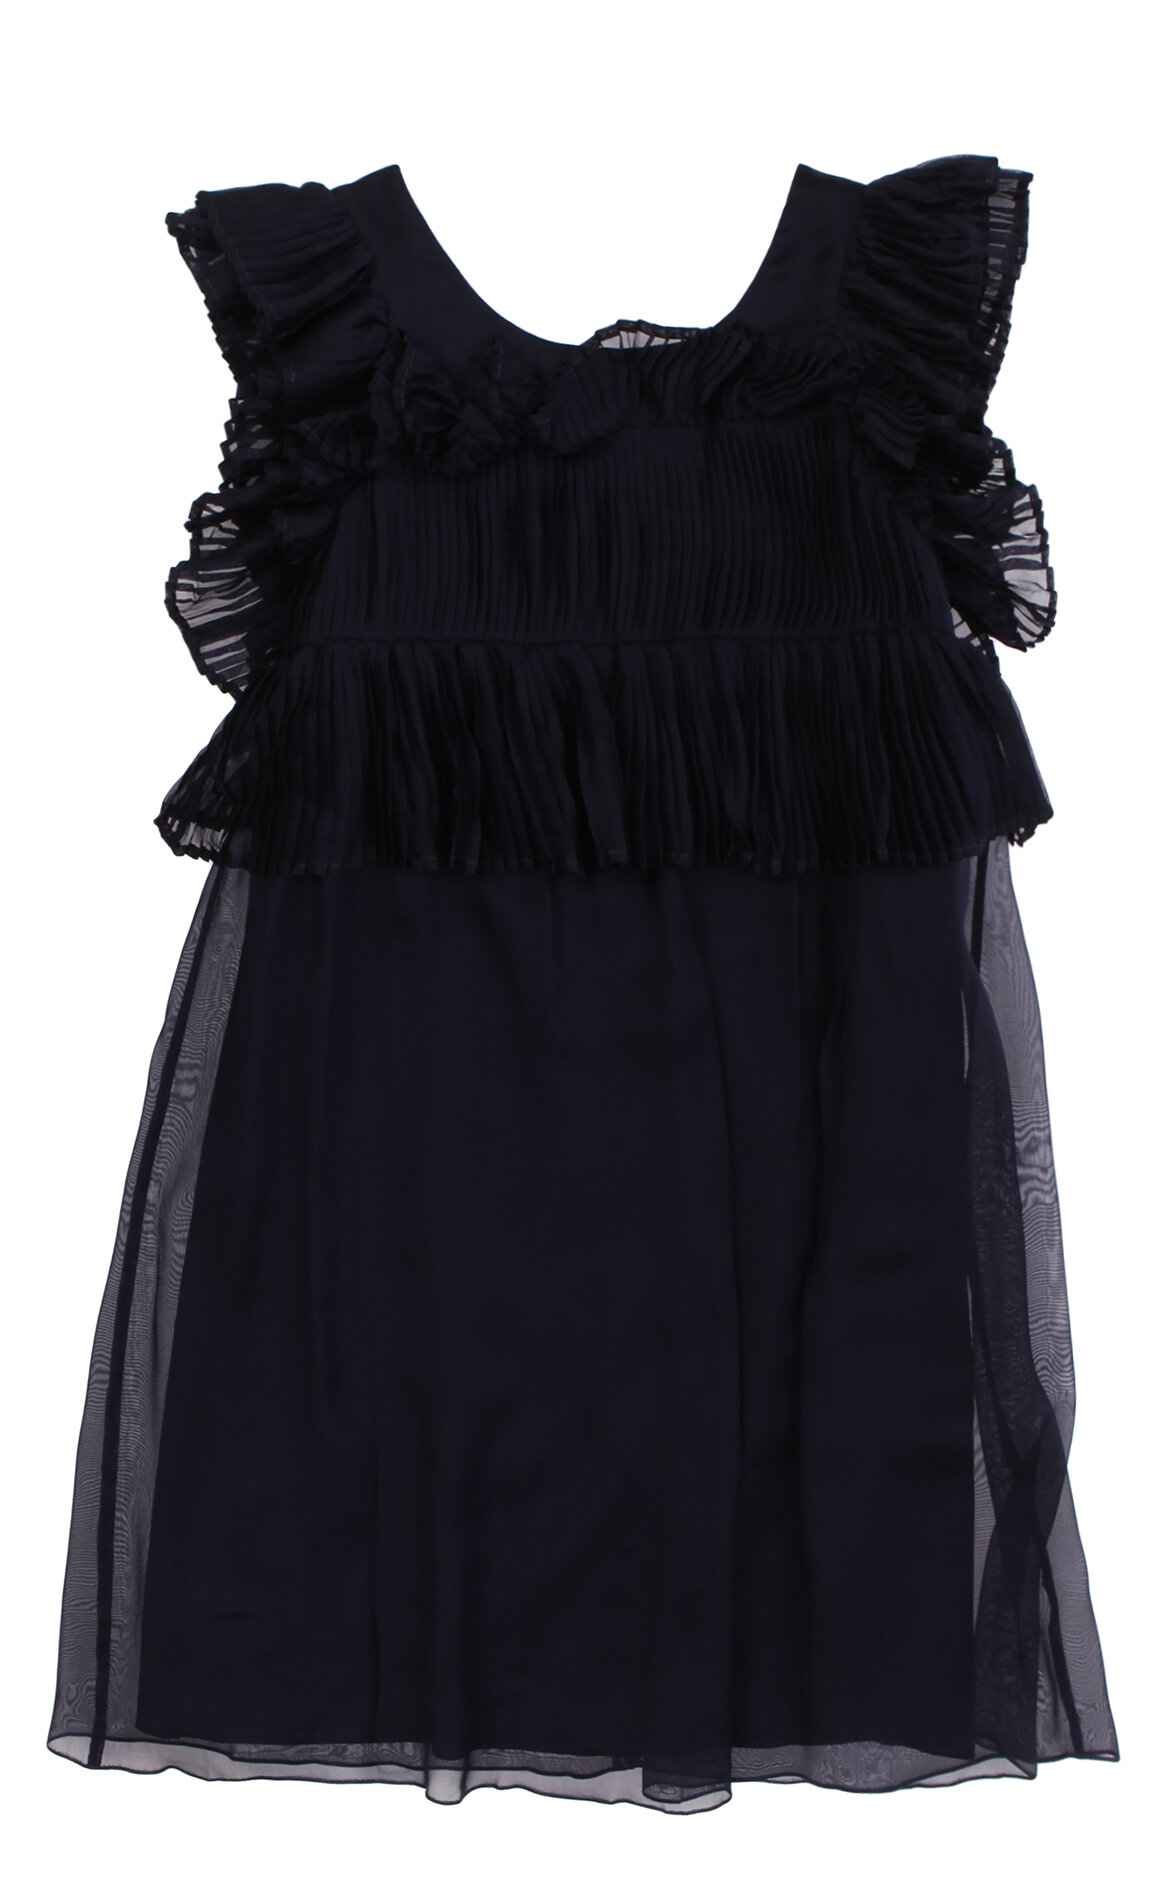 Chloé-Chloé Kız Çocuk Elbise